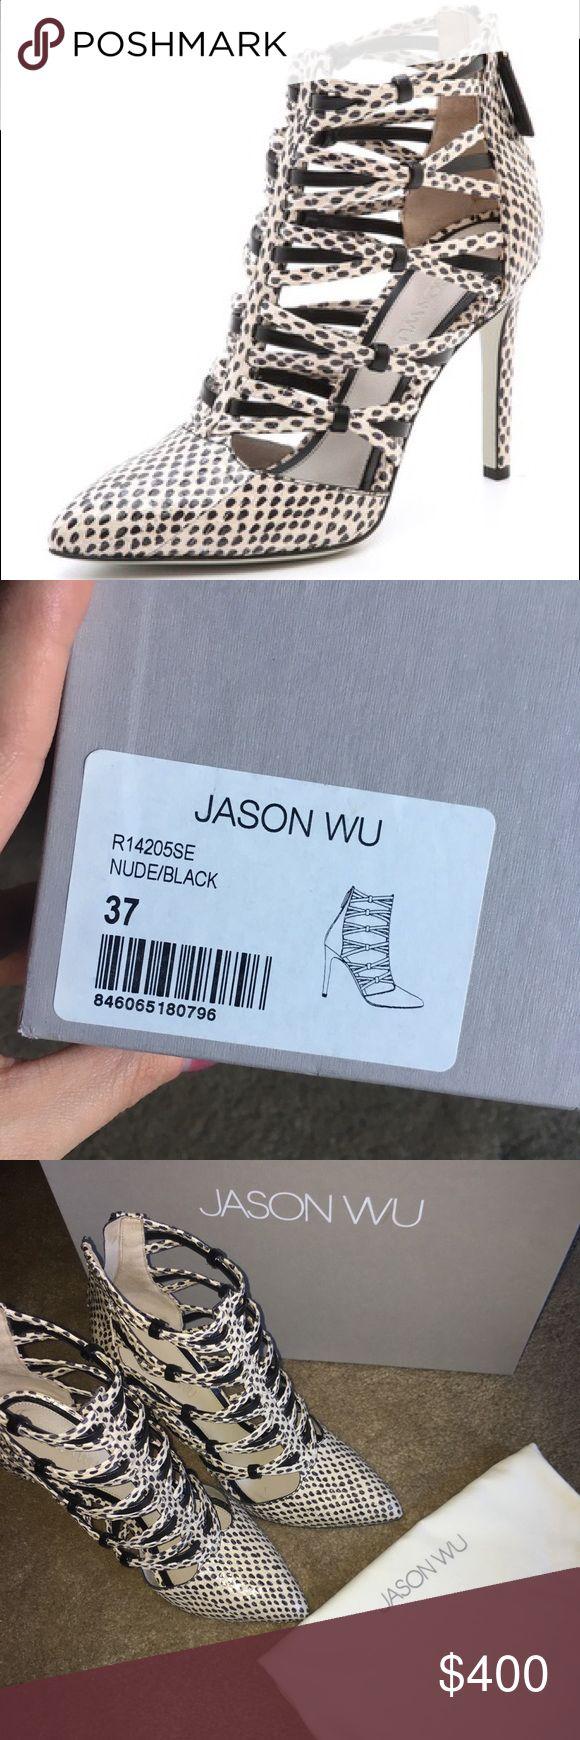 👠 Jason Wu Cages Snake Skin, Nude/Black. 👠 Jason Wu Cages Snake Skin, Nude/Black. Worn once! Comes with box and dust covers! No flaws! Jason Wu Shoes Heels